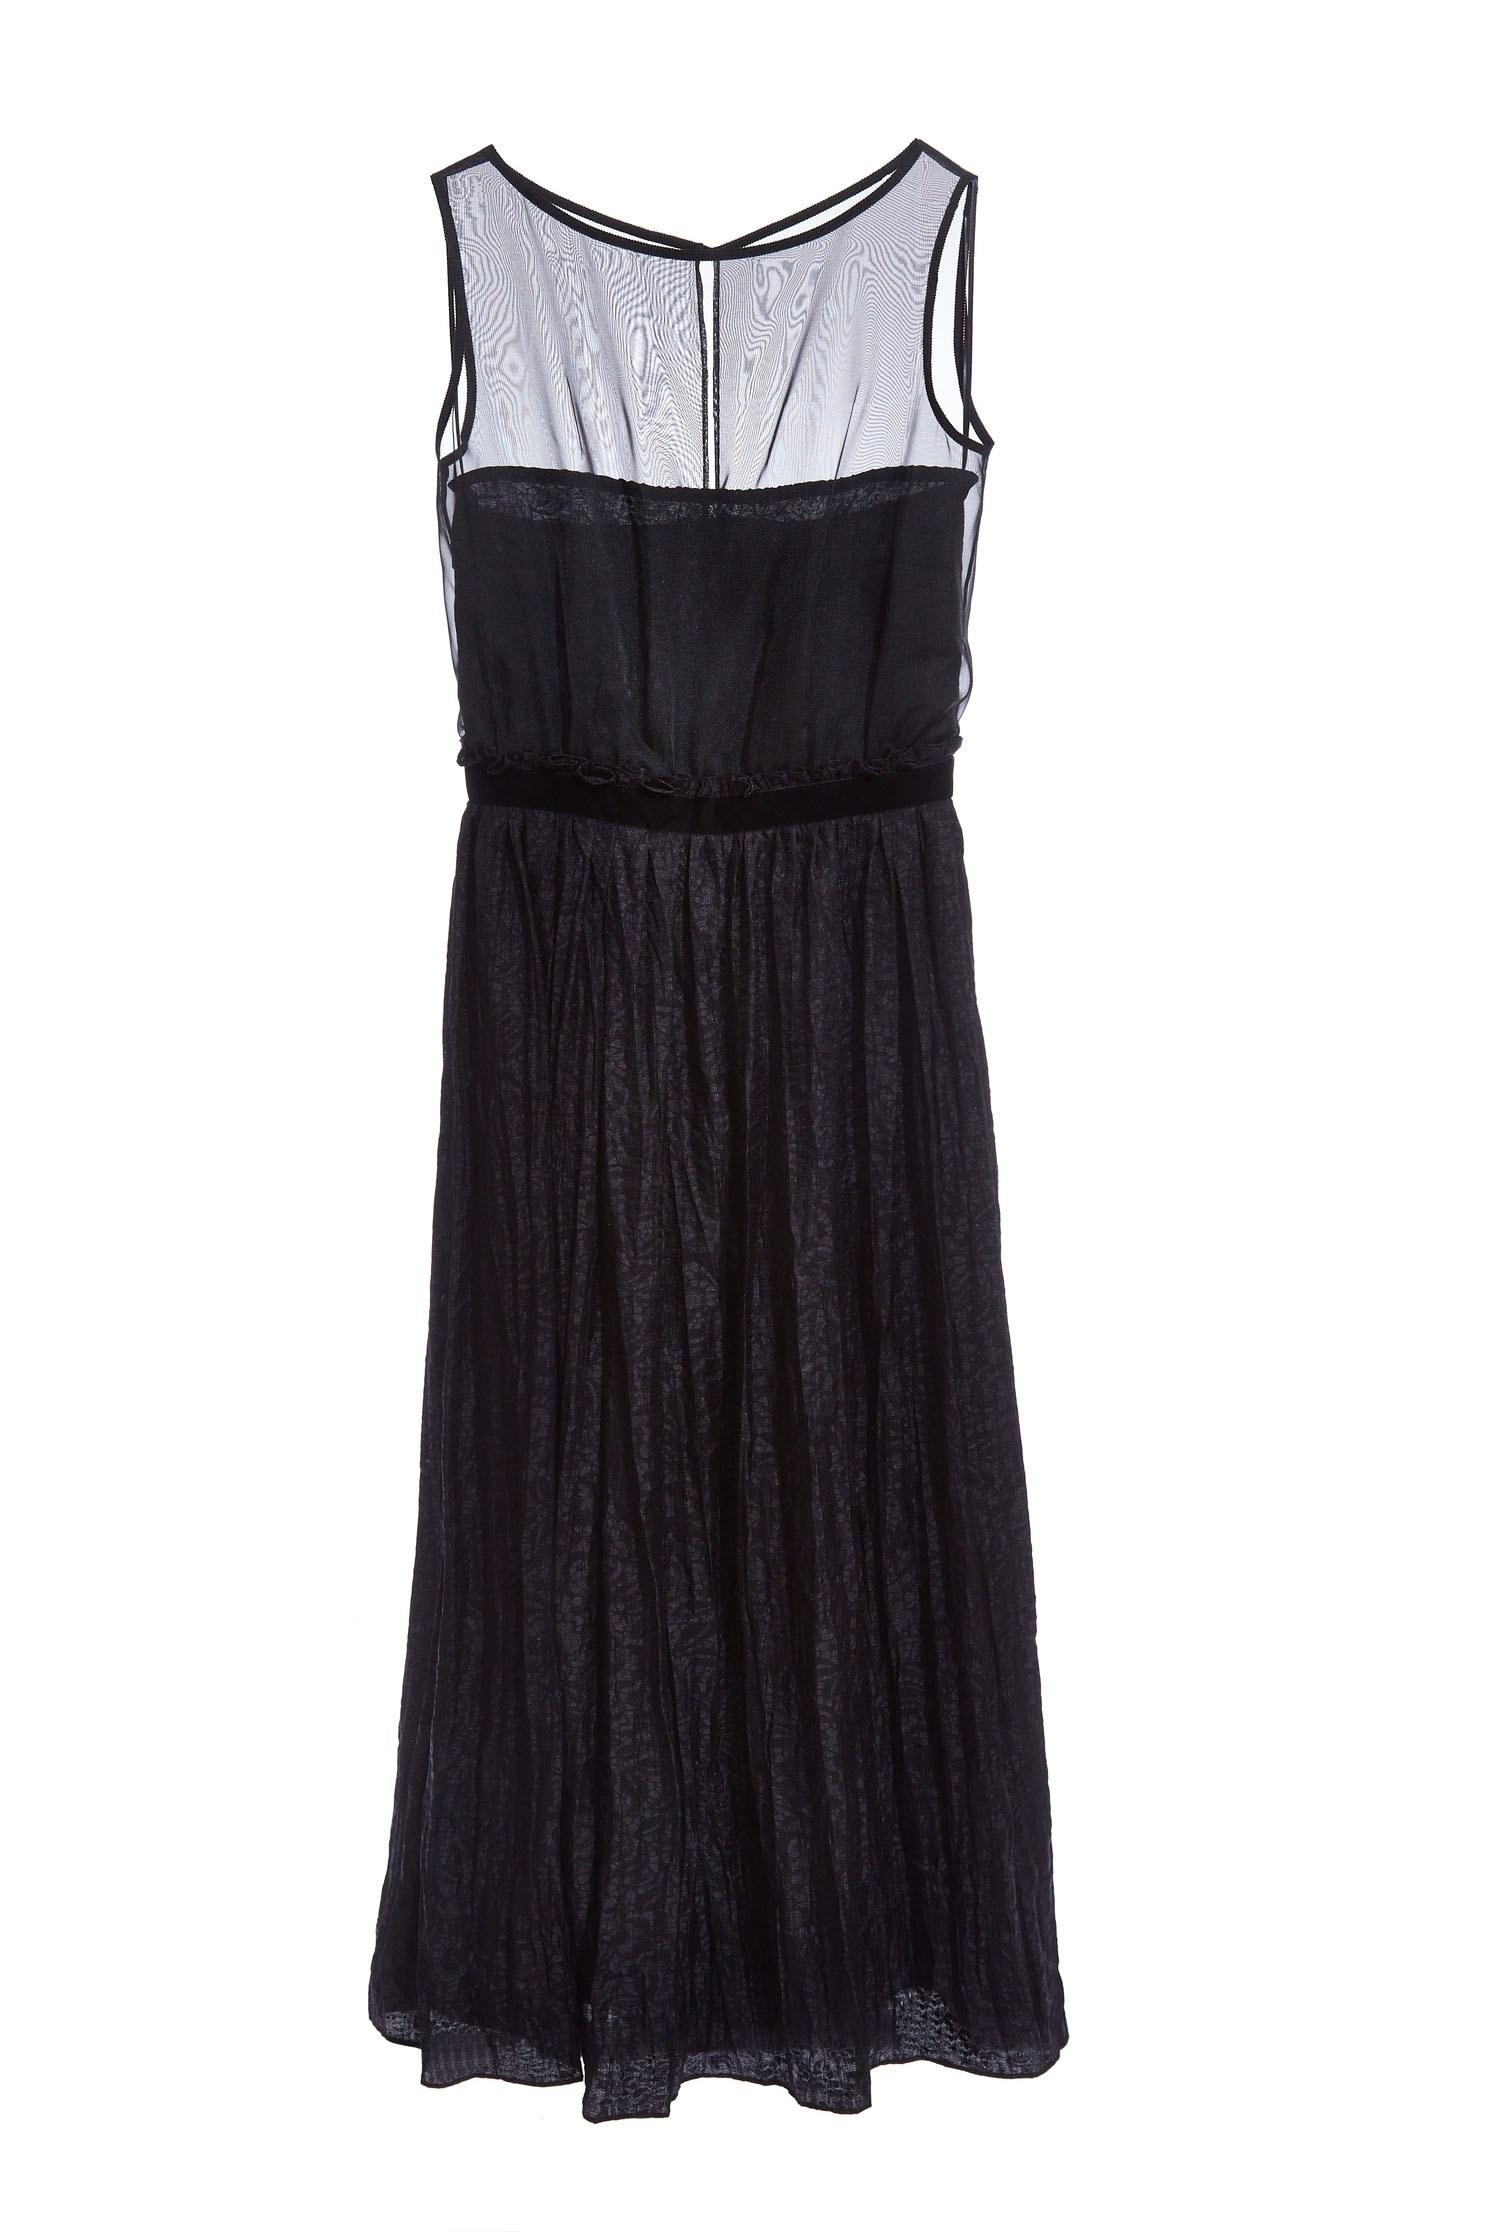 Romantic see-through  lace dress,Cocktail Dress,無袖洋裝,Evening Wear,透膚洋裝,Chiffon,Chiffon Dress,Black dress